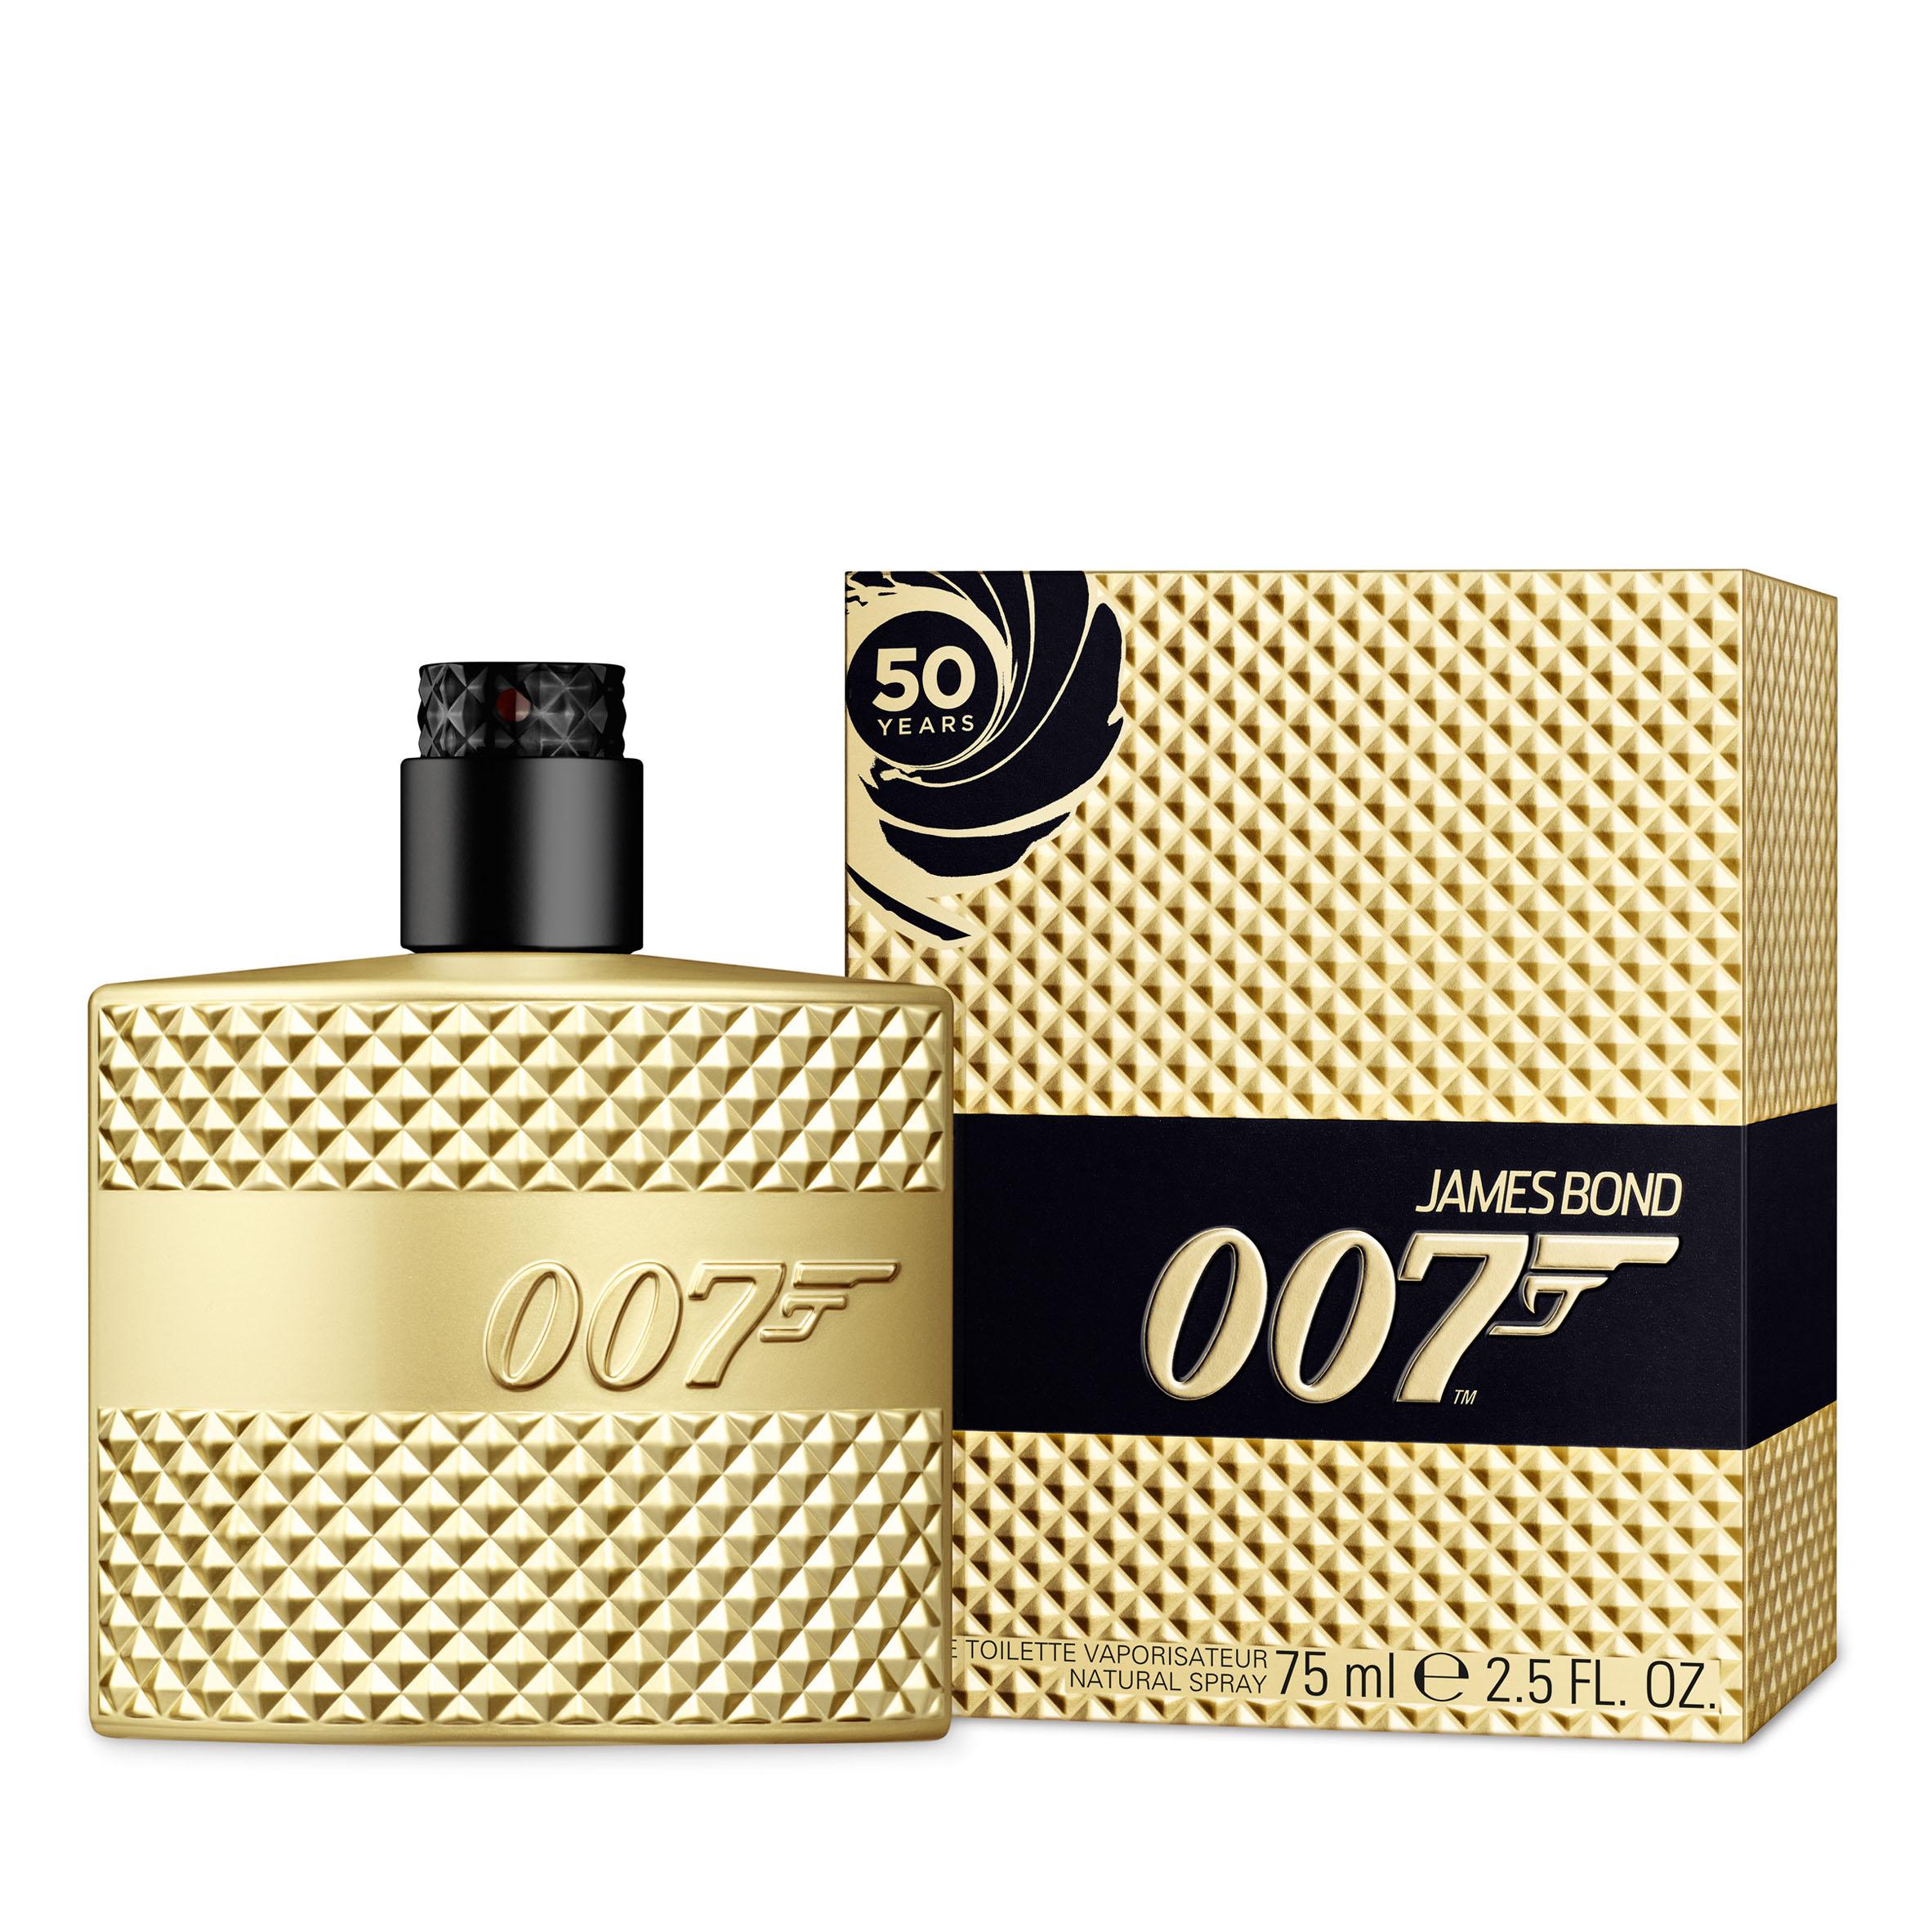 James Bond 007 Fragrance | Kettle Rose